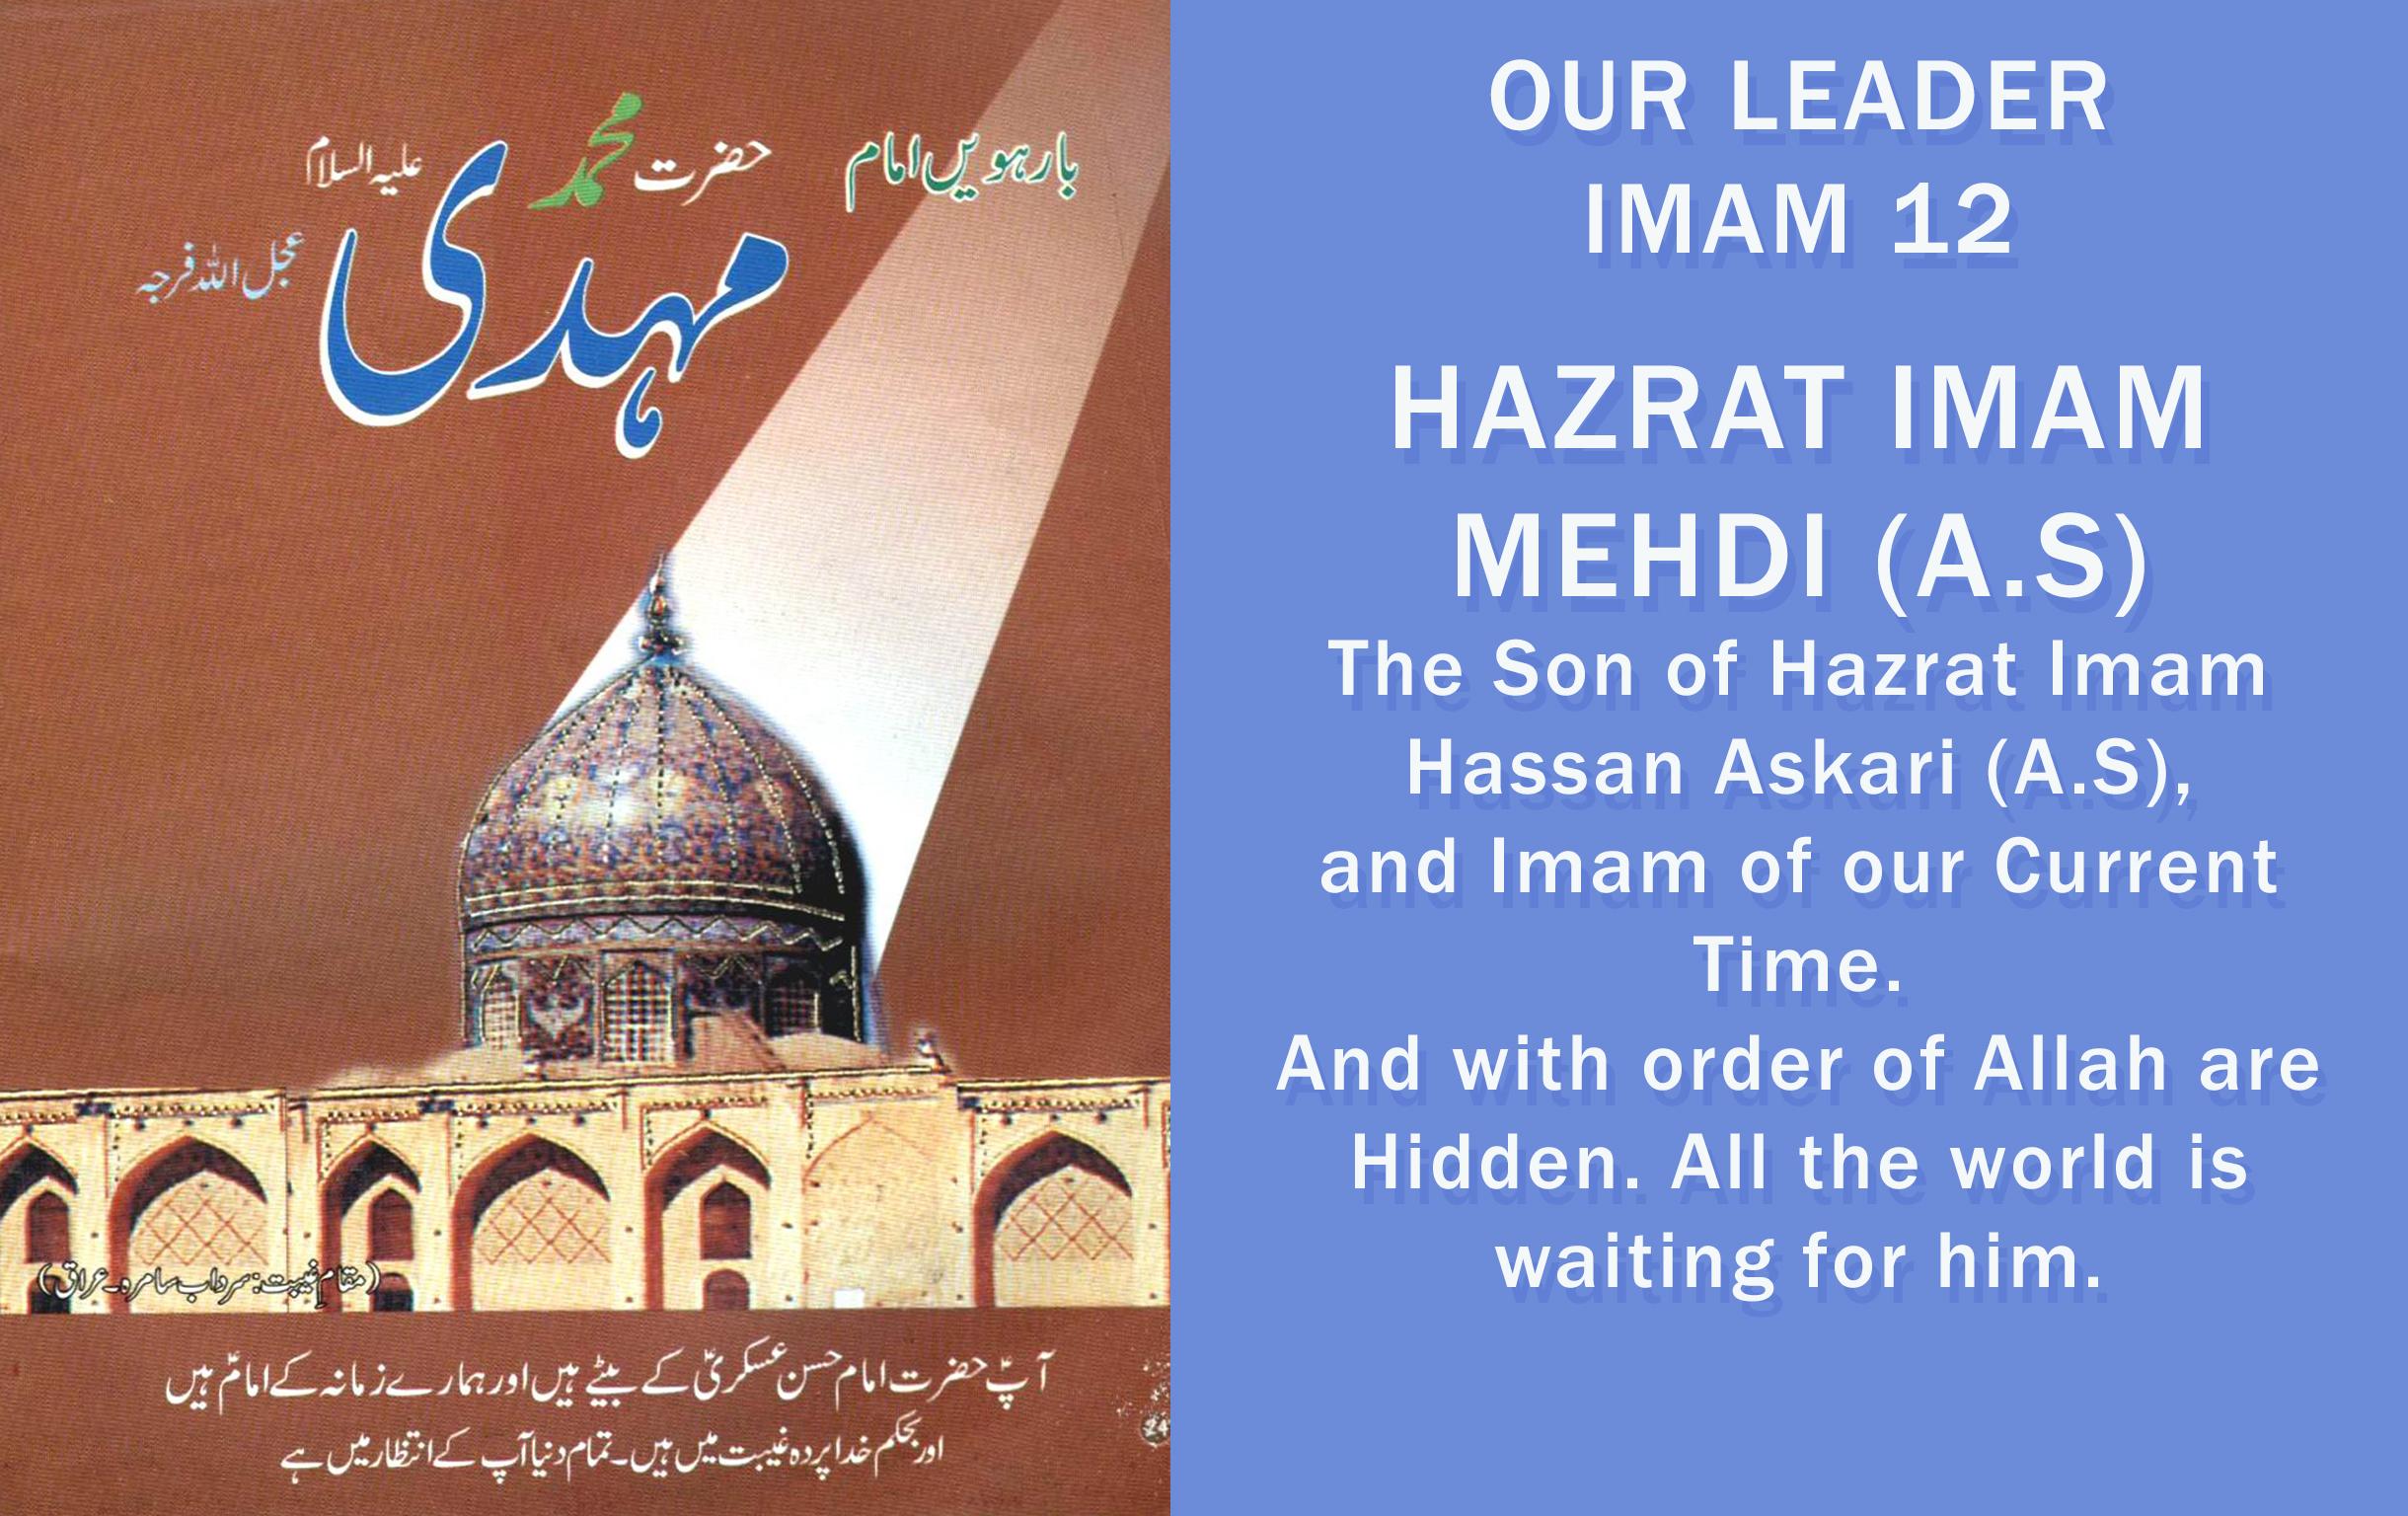 Hazrat Imam Mehdi A.S